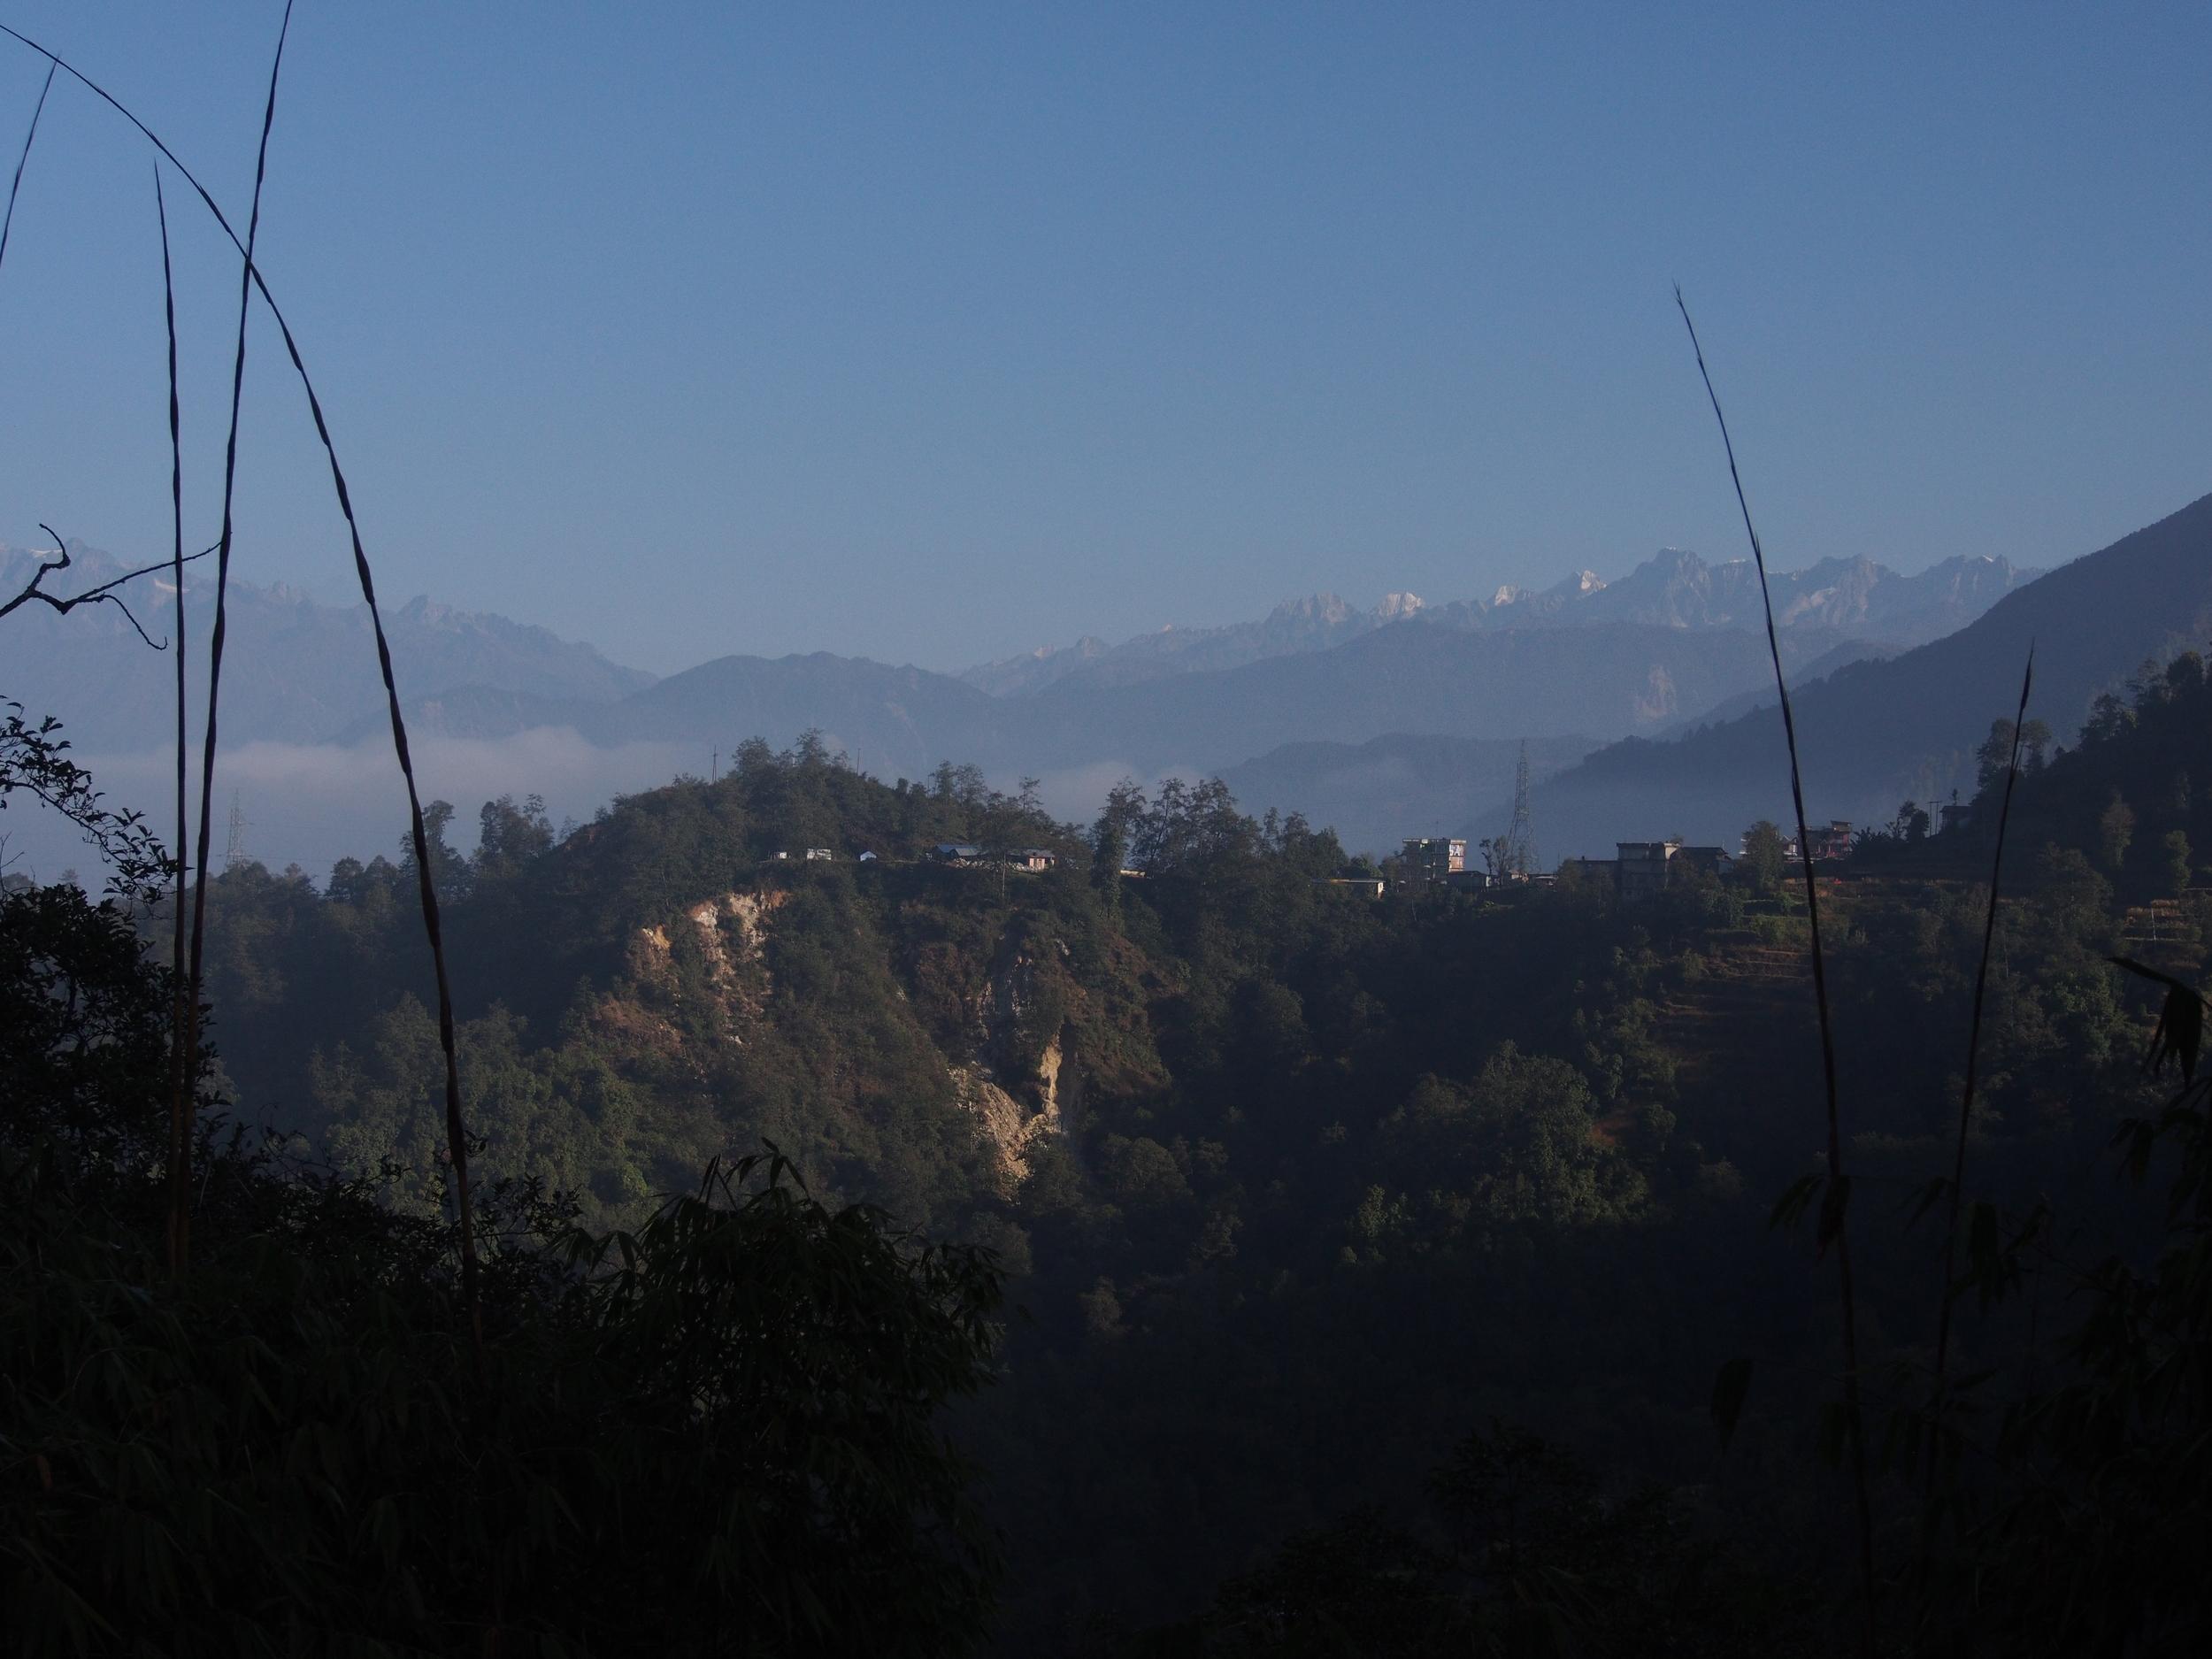 View of the high Himalaya as we began ascending the dirt road